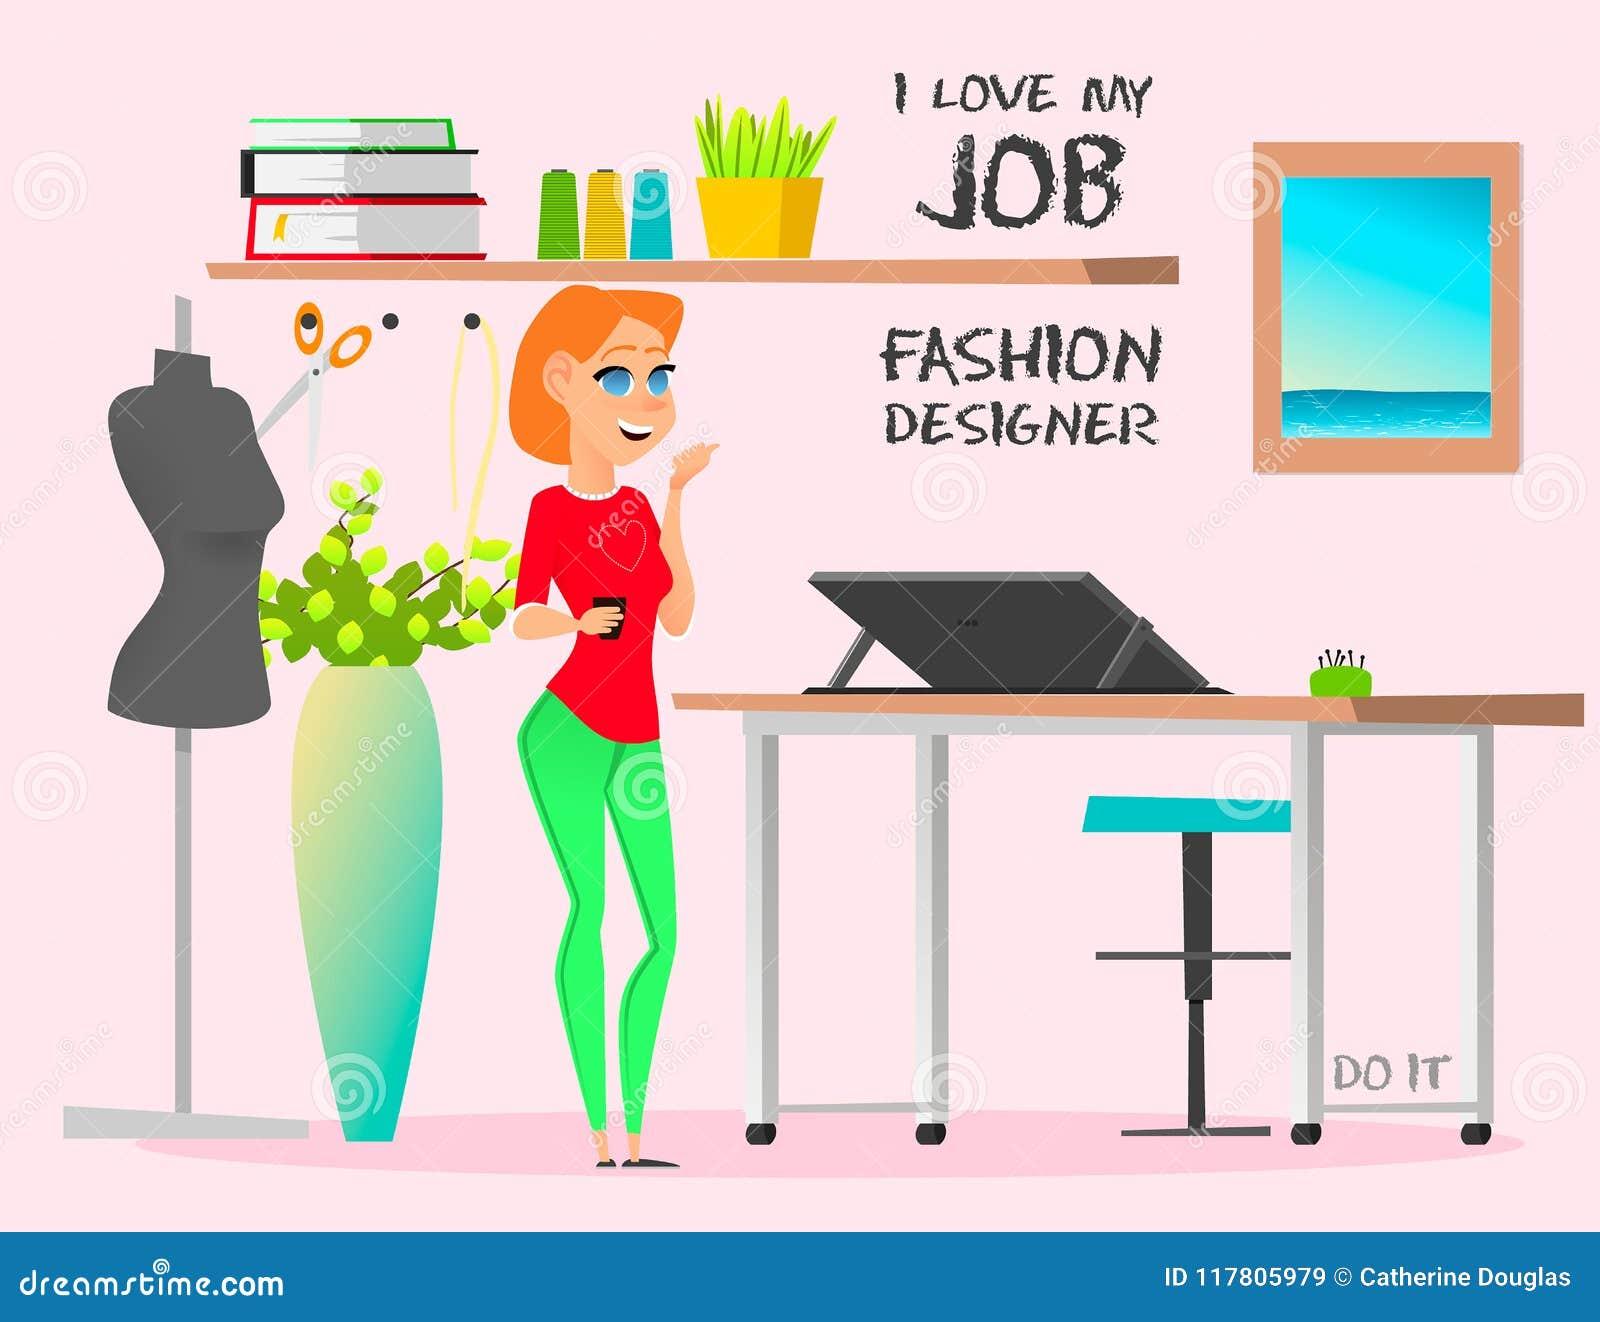 Dream Job Fashion Designer Do It Stock Vector Illustration Of Fashion Books 117805979